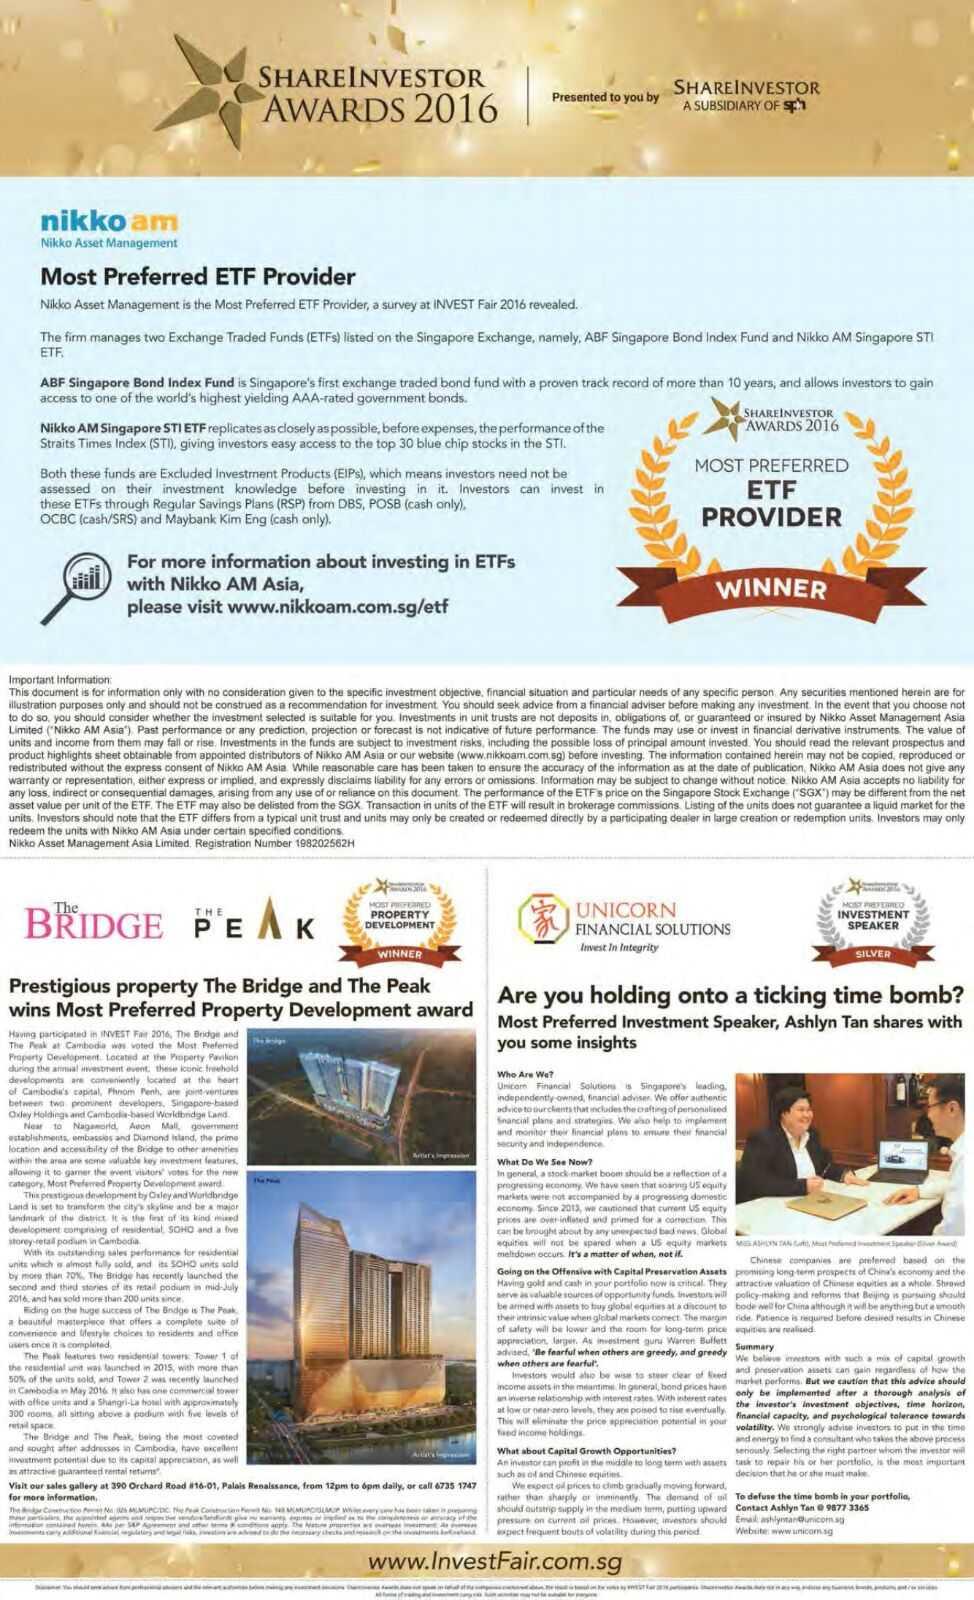 thebridge-thepeak-cambodia-awards-1